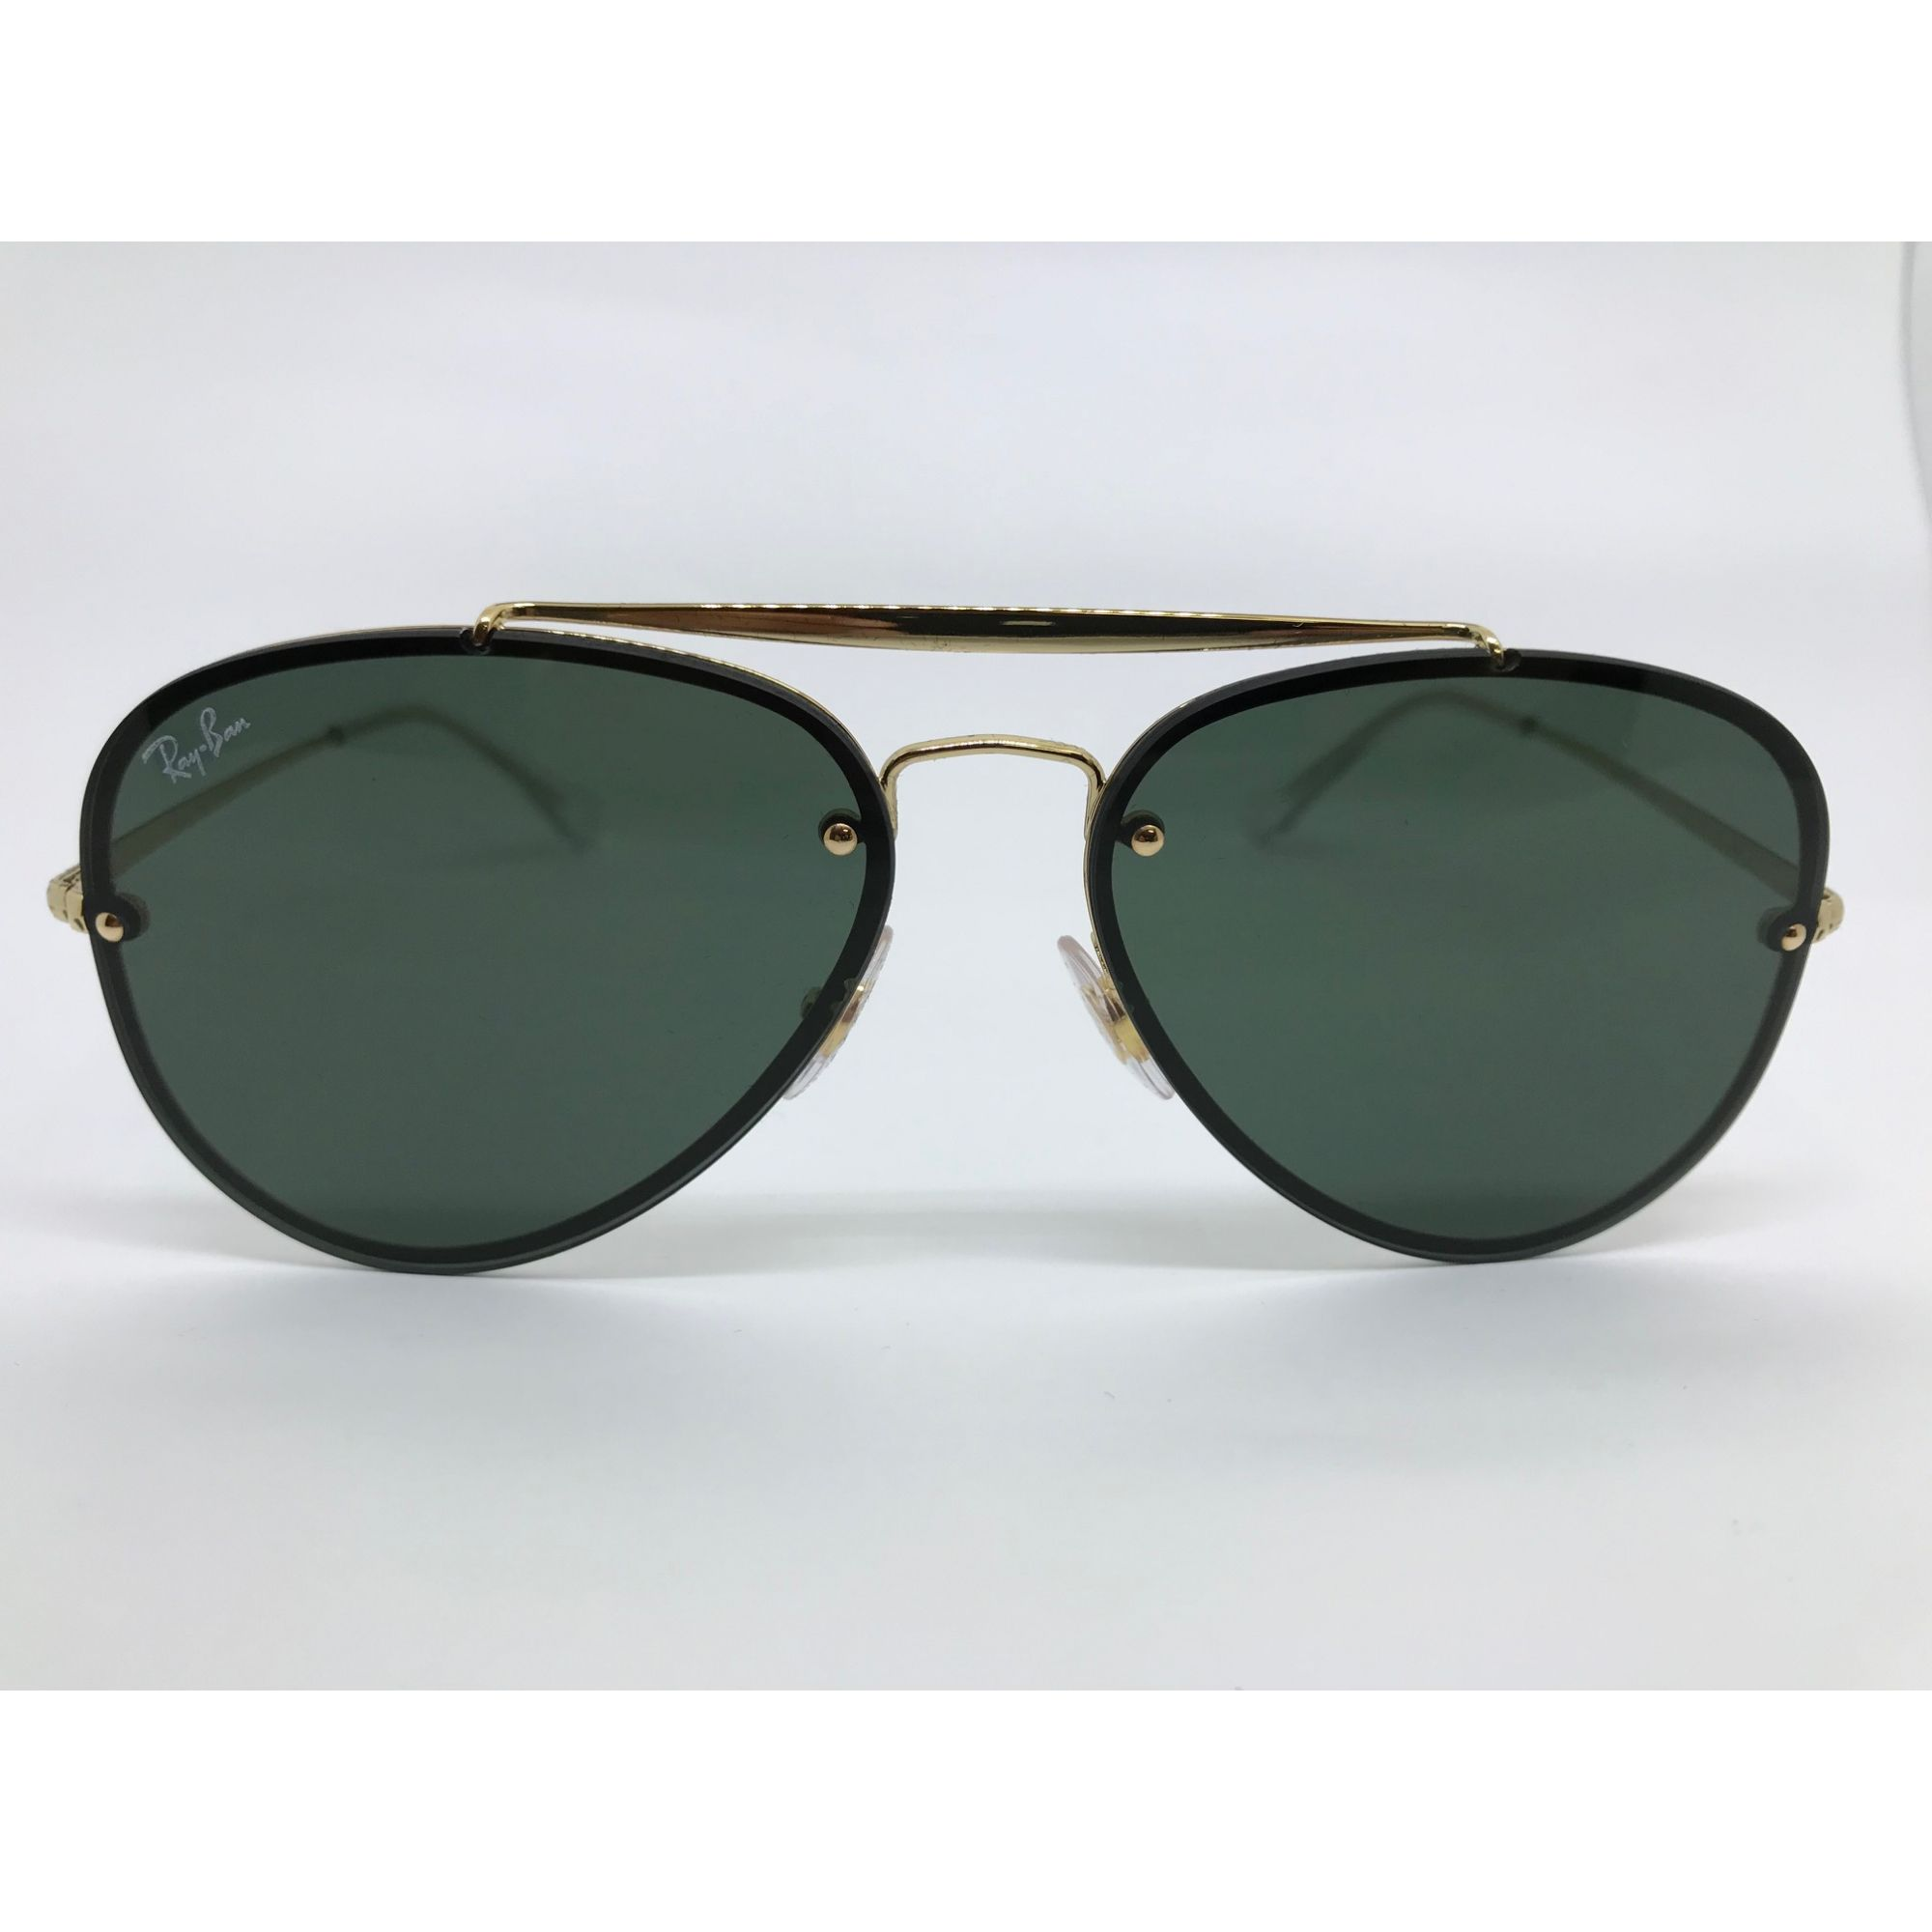 4a2113dfa Oculos de sol Ray Ban Blaze Aviator RB 3584N 905071 58